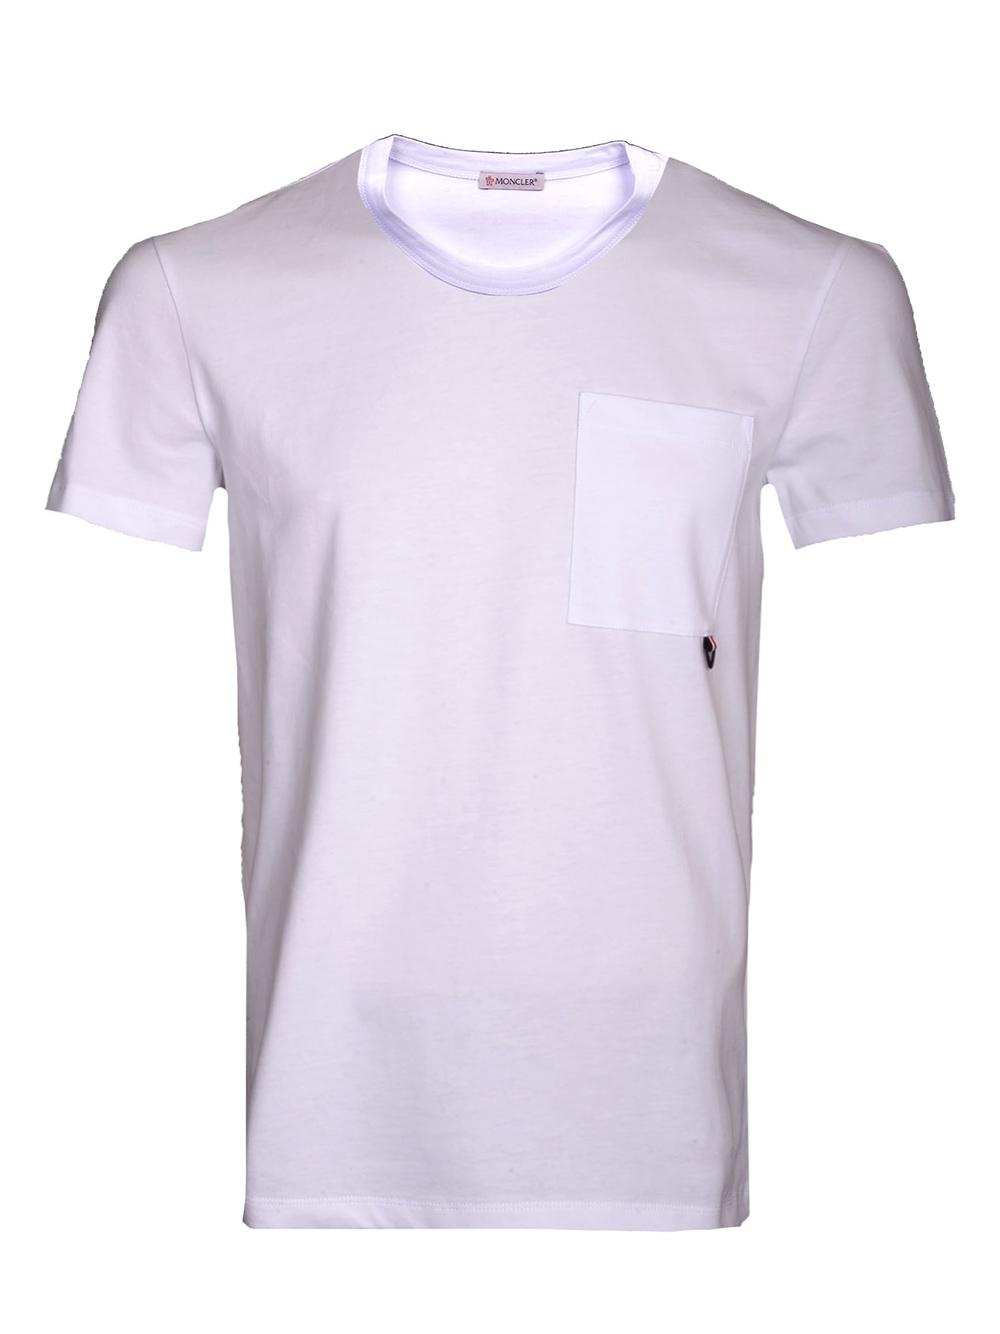 MONCLER Μπλούζα T-Shirt E1-091-8040250 ΛΕΥΚΟ